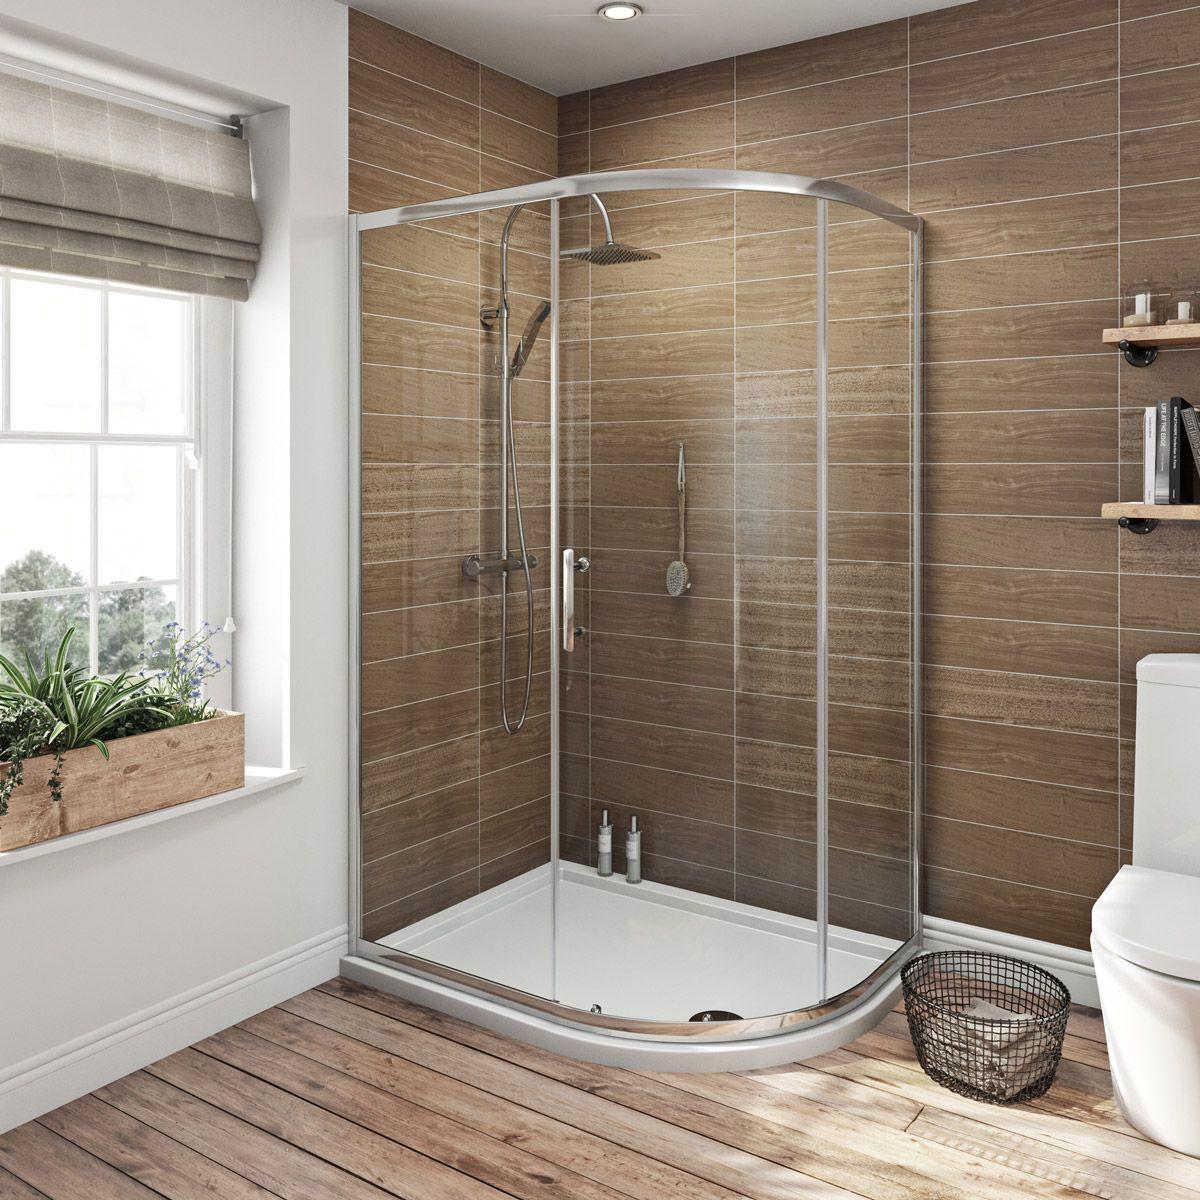 Orchard 6mm single door offset quadrant shower enclosure | Shower ...